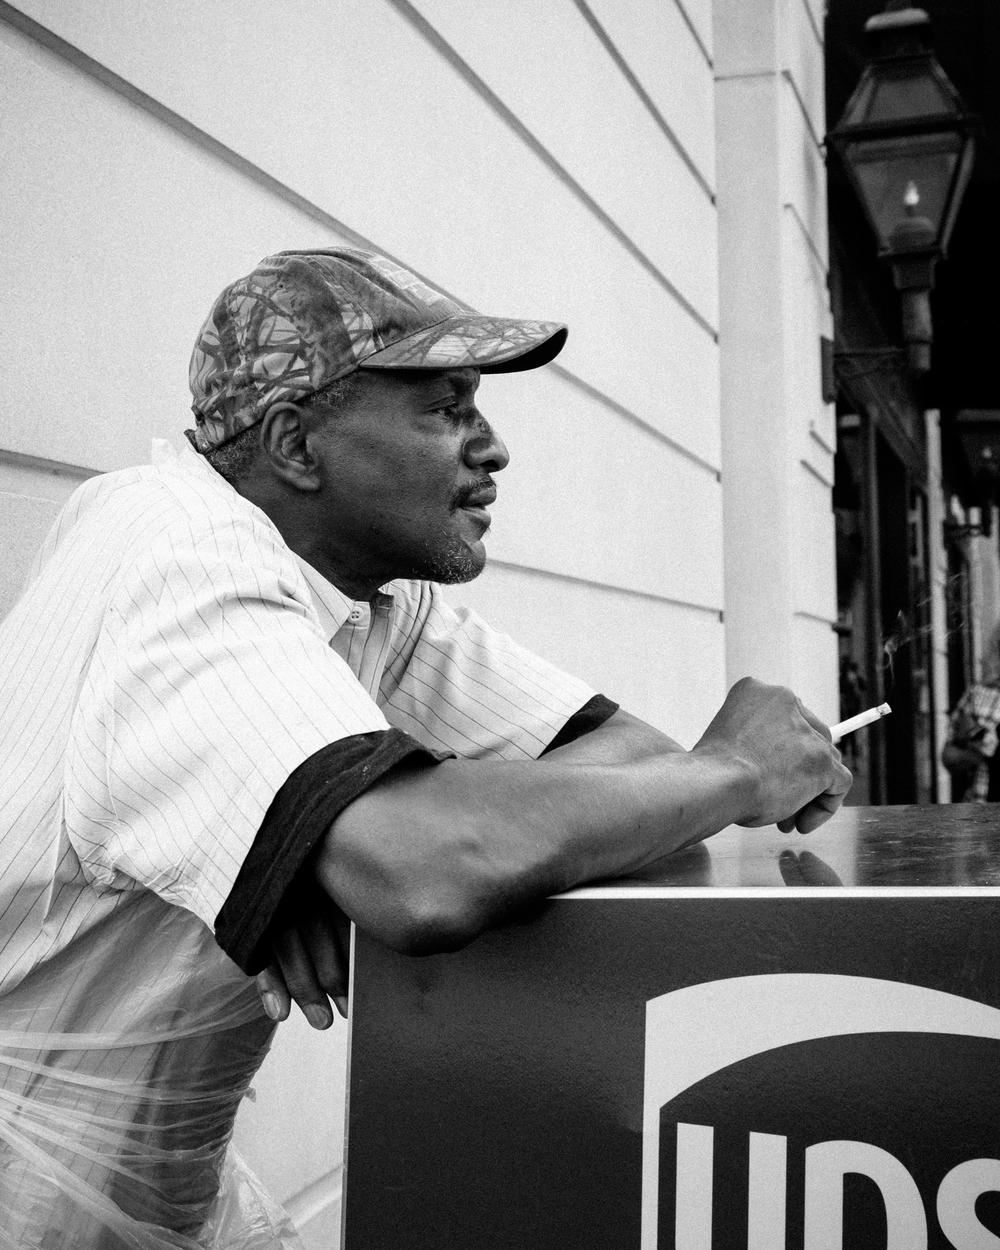 Aaron, Street portrait, May 13, 2016